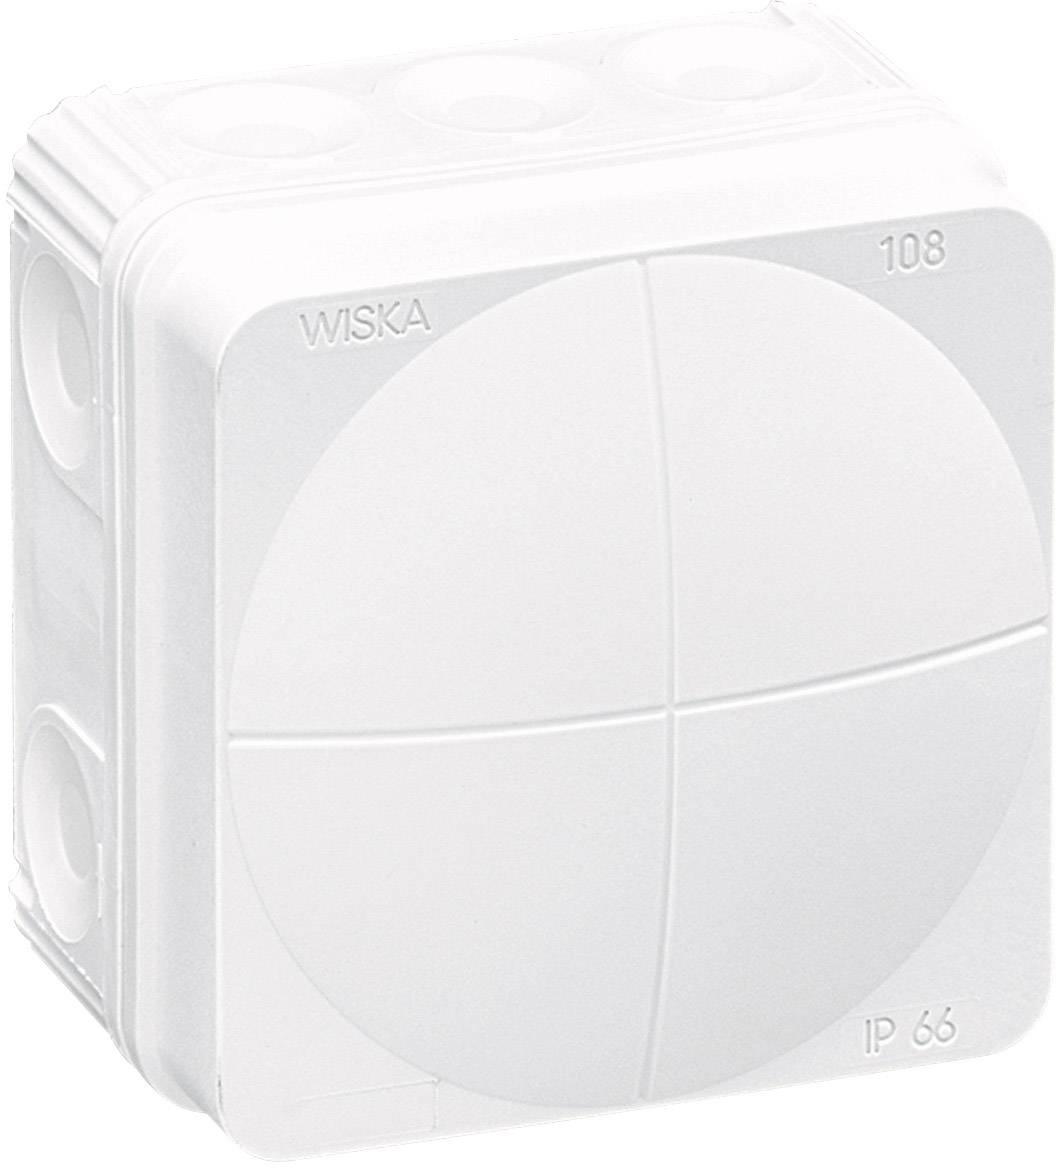 Rozbočovacia krabica Wiska Combi 108, IP66, biela, 10060622